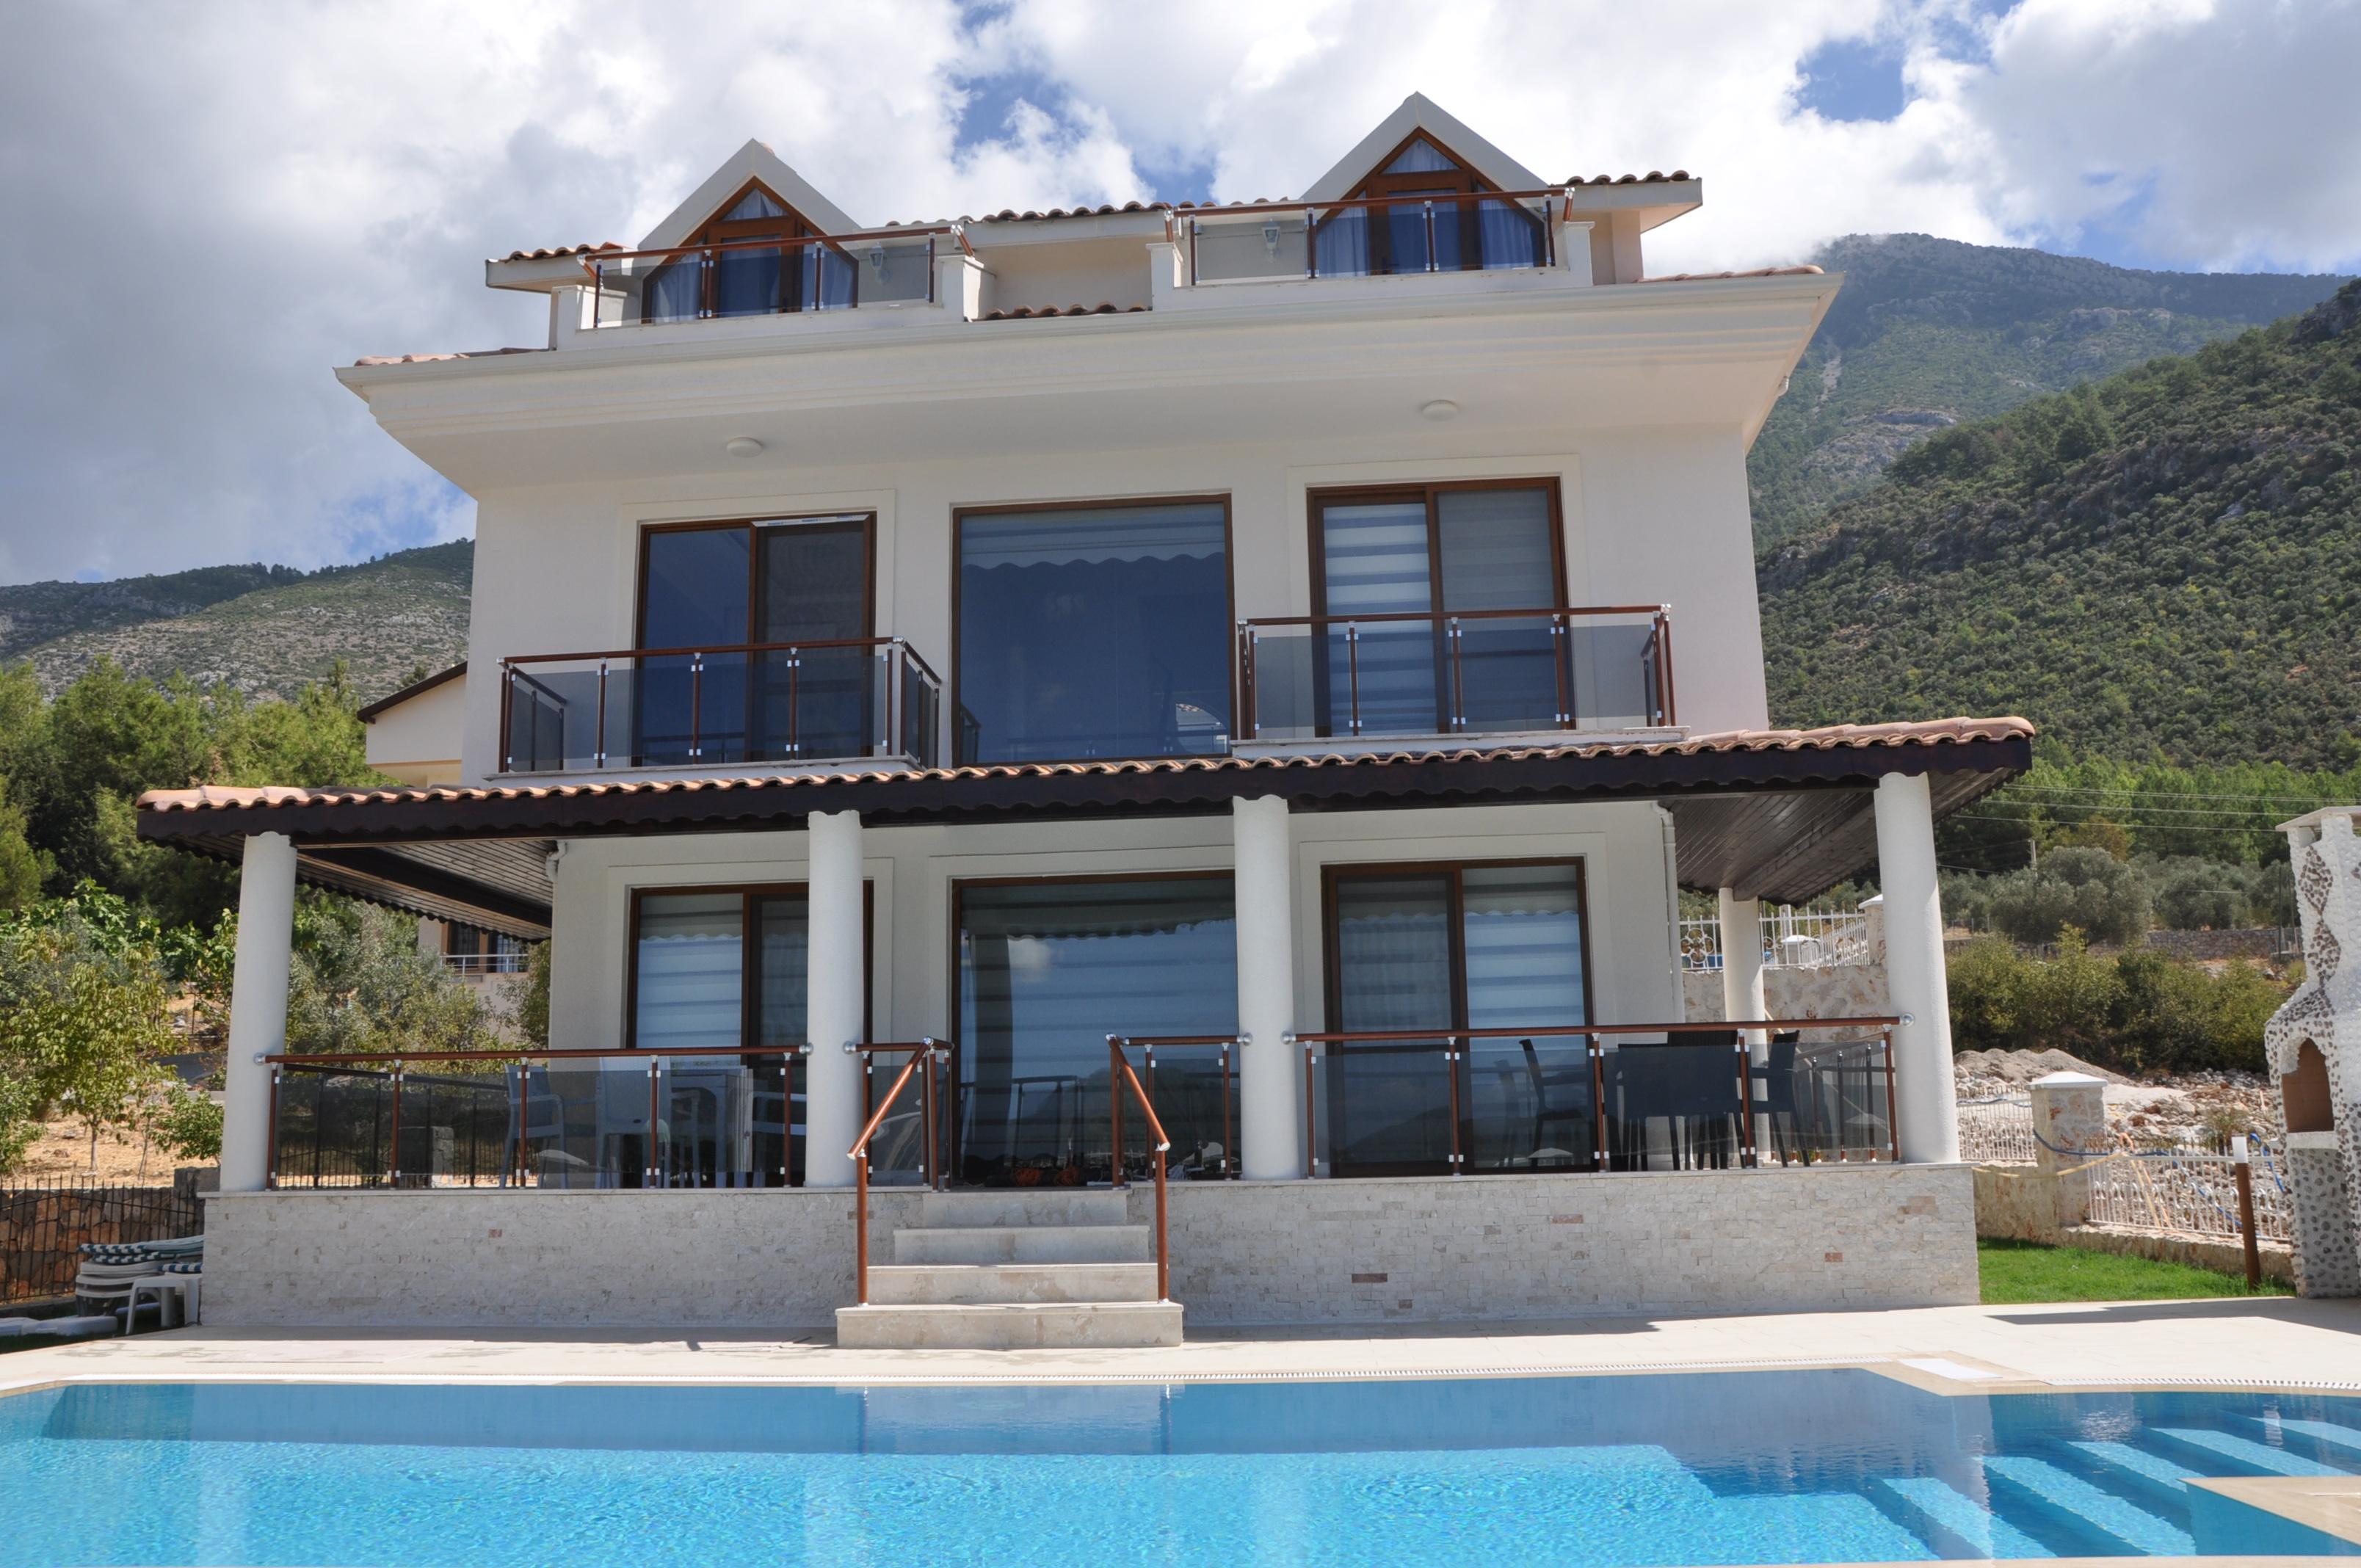 4 Bed Short Term Rental Villa Fethiye Olu Deniz